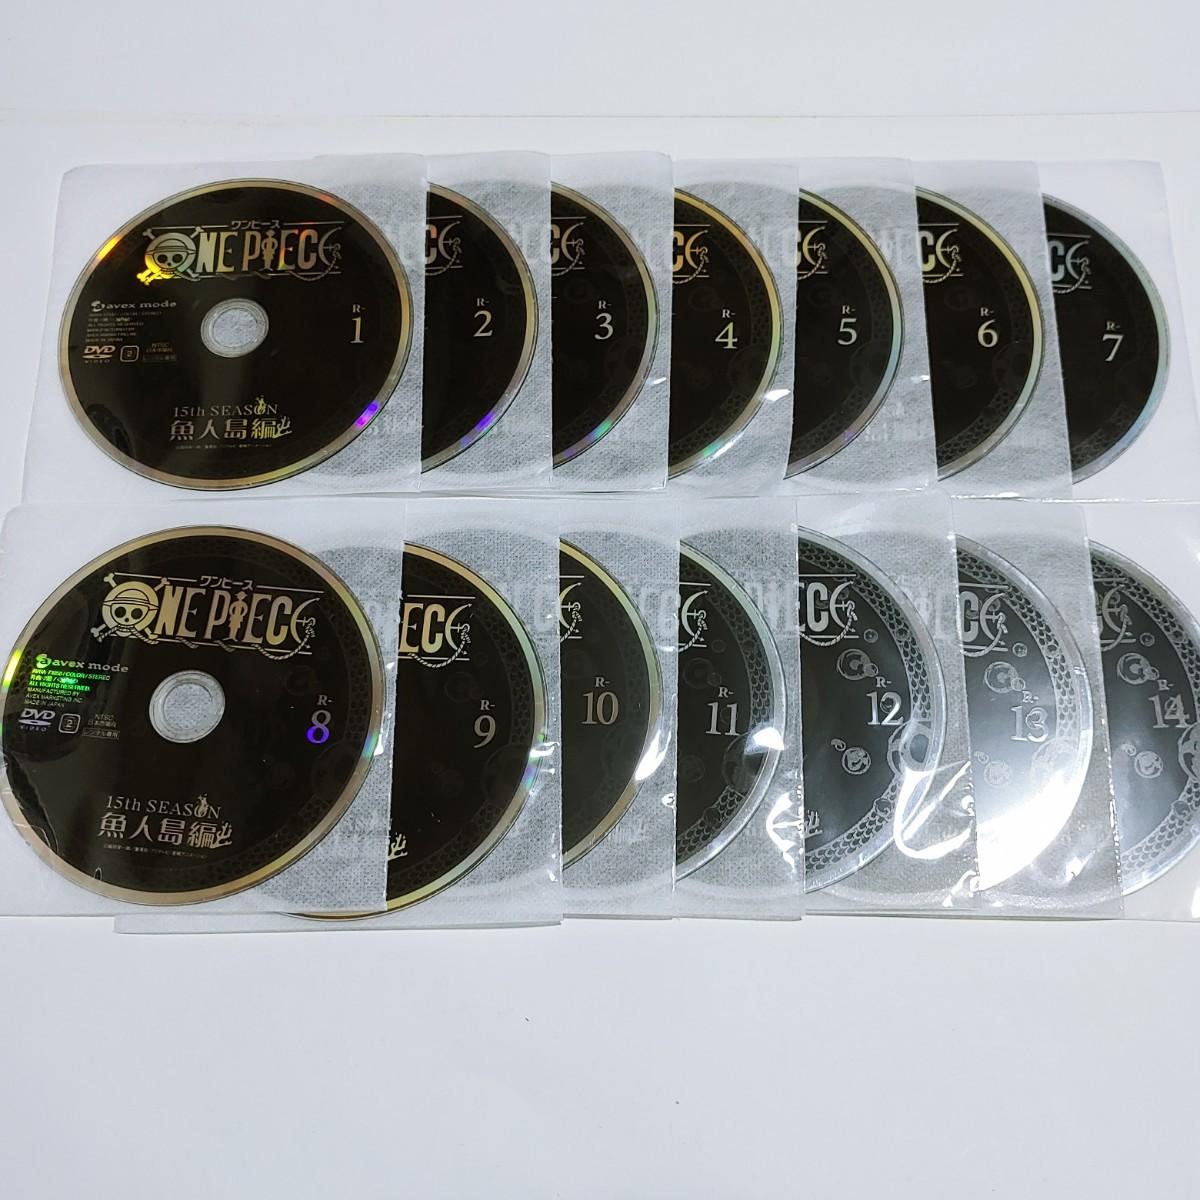 [DVD]ONE PIECE ワンピース~15thシーズン 魚人島編 全14巻